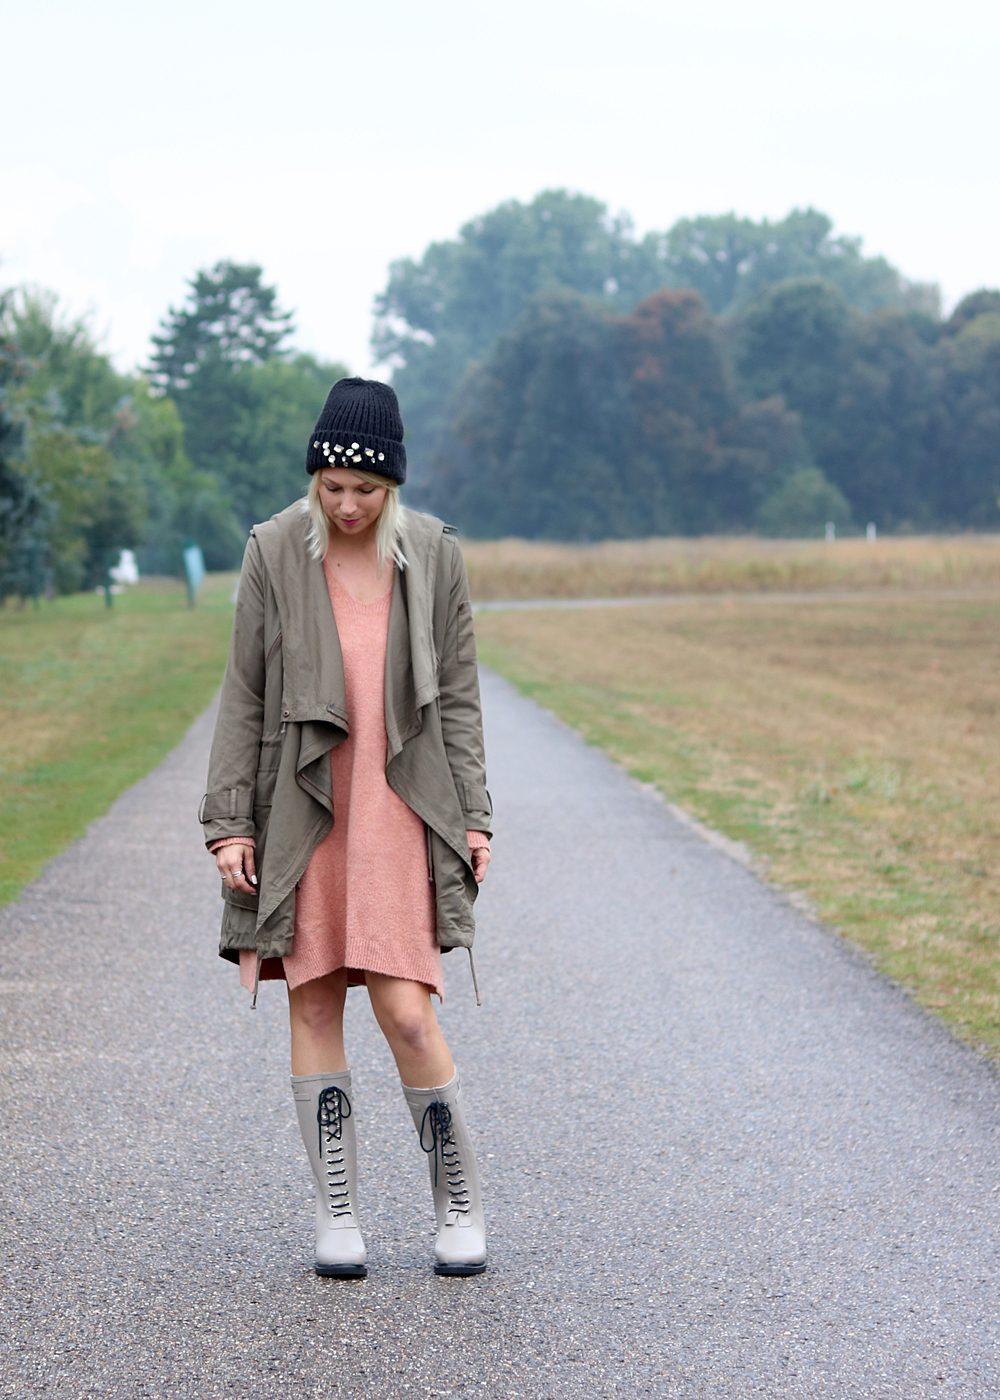 Fashionblogger Outfit Gummistiefel Ilse Jacobsen Strickkleid rosa Parka khaki Oversize Beanie mit Glitzersteinen (3)